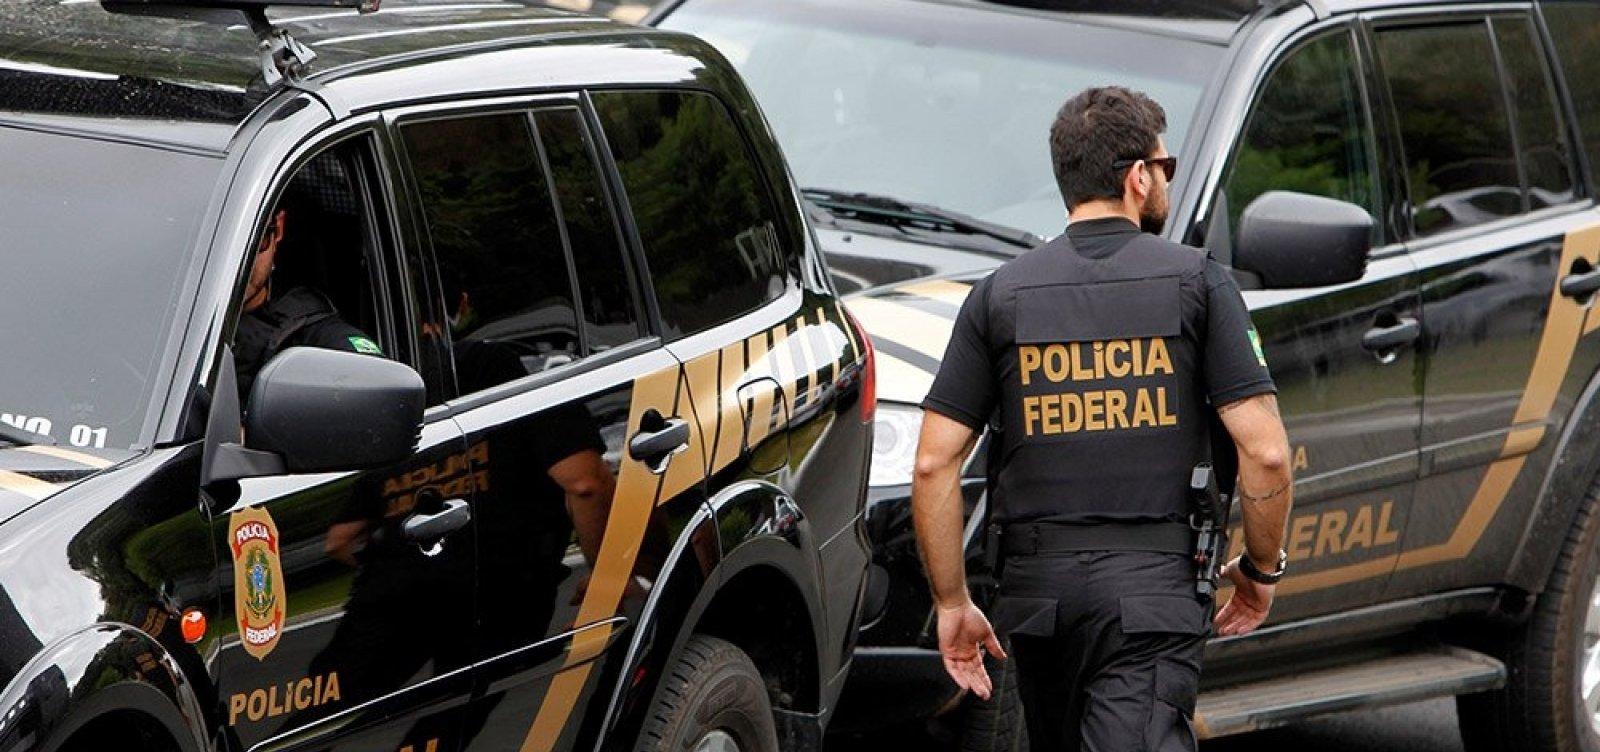 [Polícia Federal prende vice-governador de Minas Gerais e Joesley Batista  ]